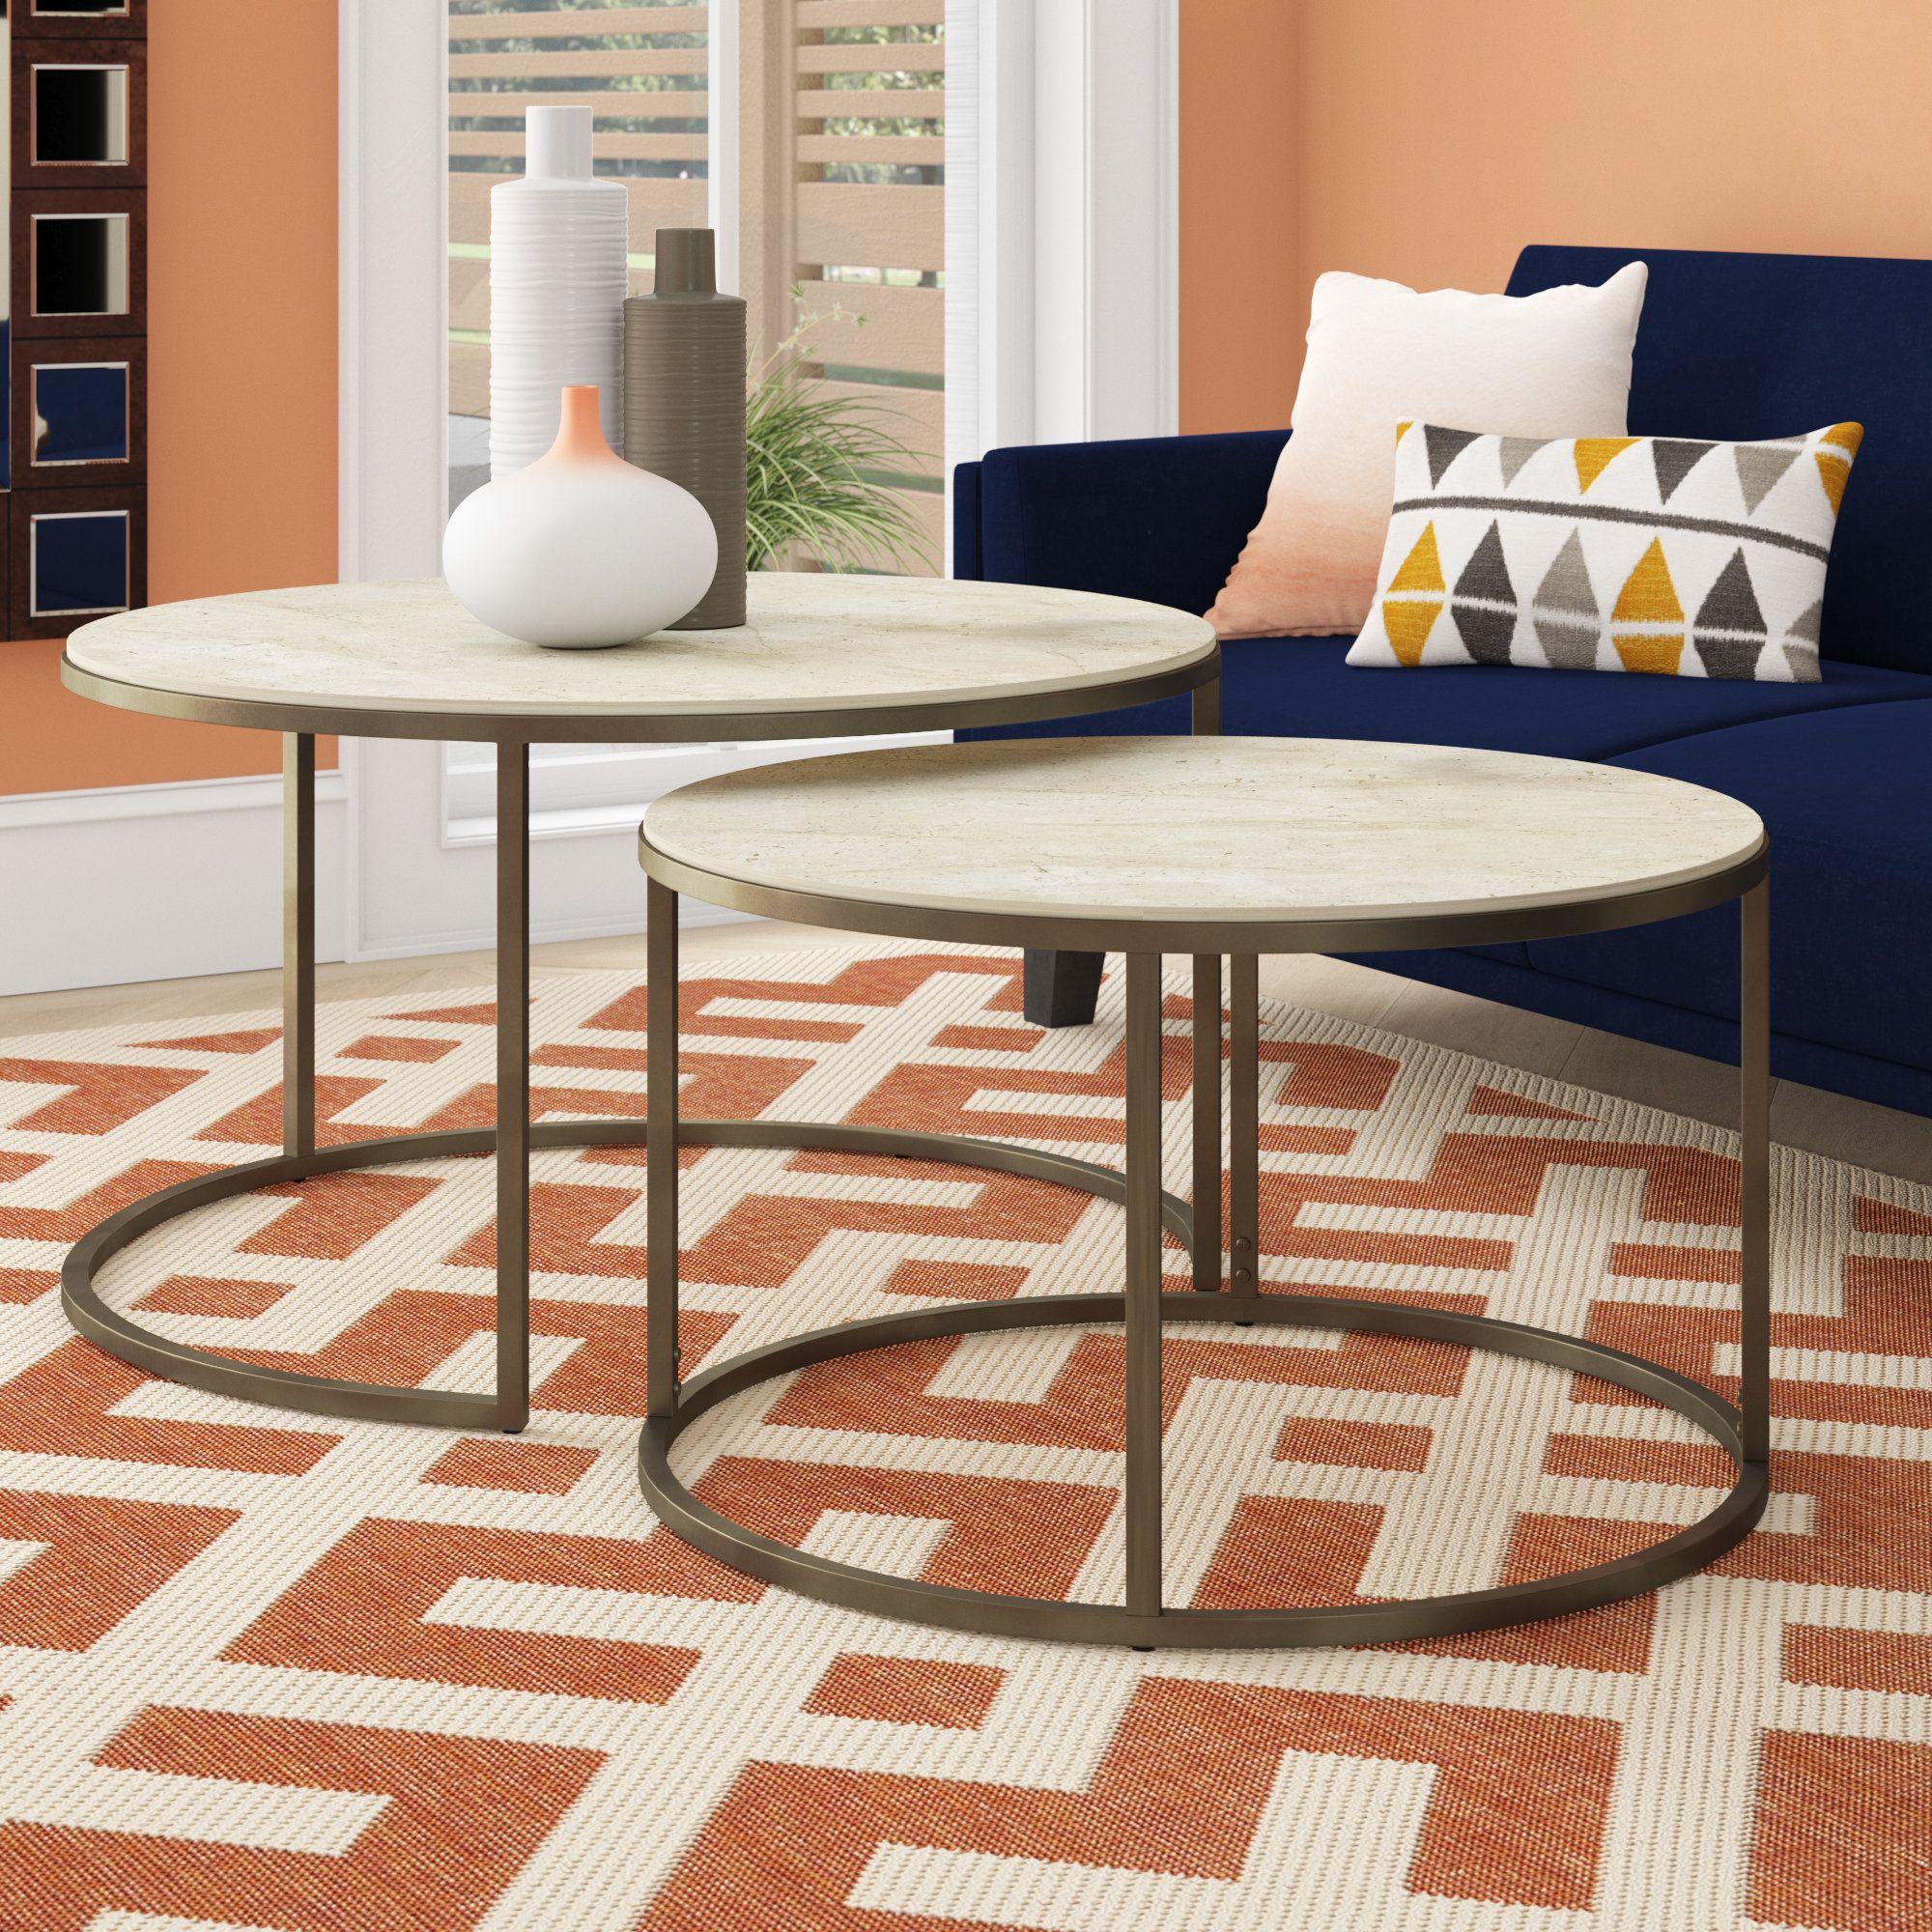 Masuda 2 Piece Coffee Table Set Coffee Table Stone Coffee Table Furniture [ 2000 x 2000 Pixel ]